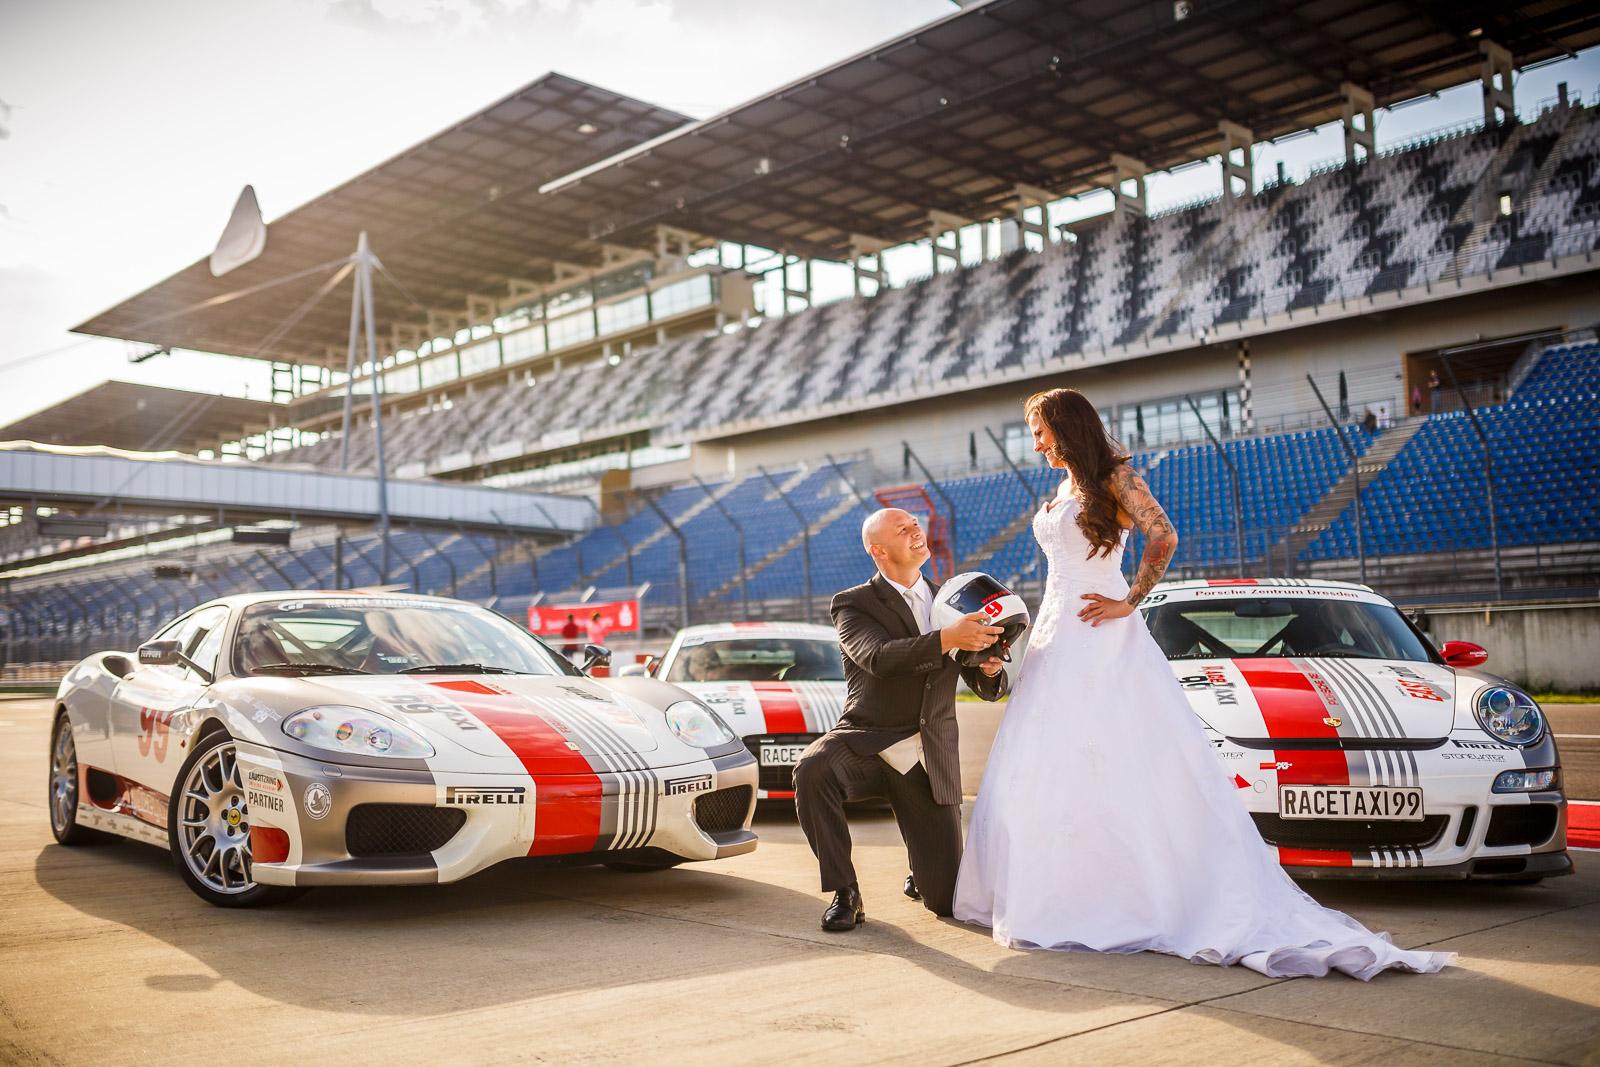 Hochzeitsfotograf Schipkau Lausitzring RaceTaxi - newpic.eu by Toni Kretschmer